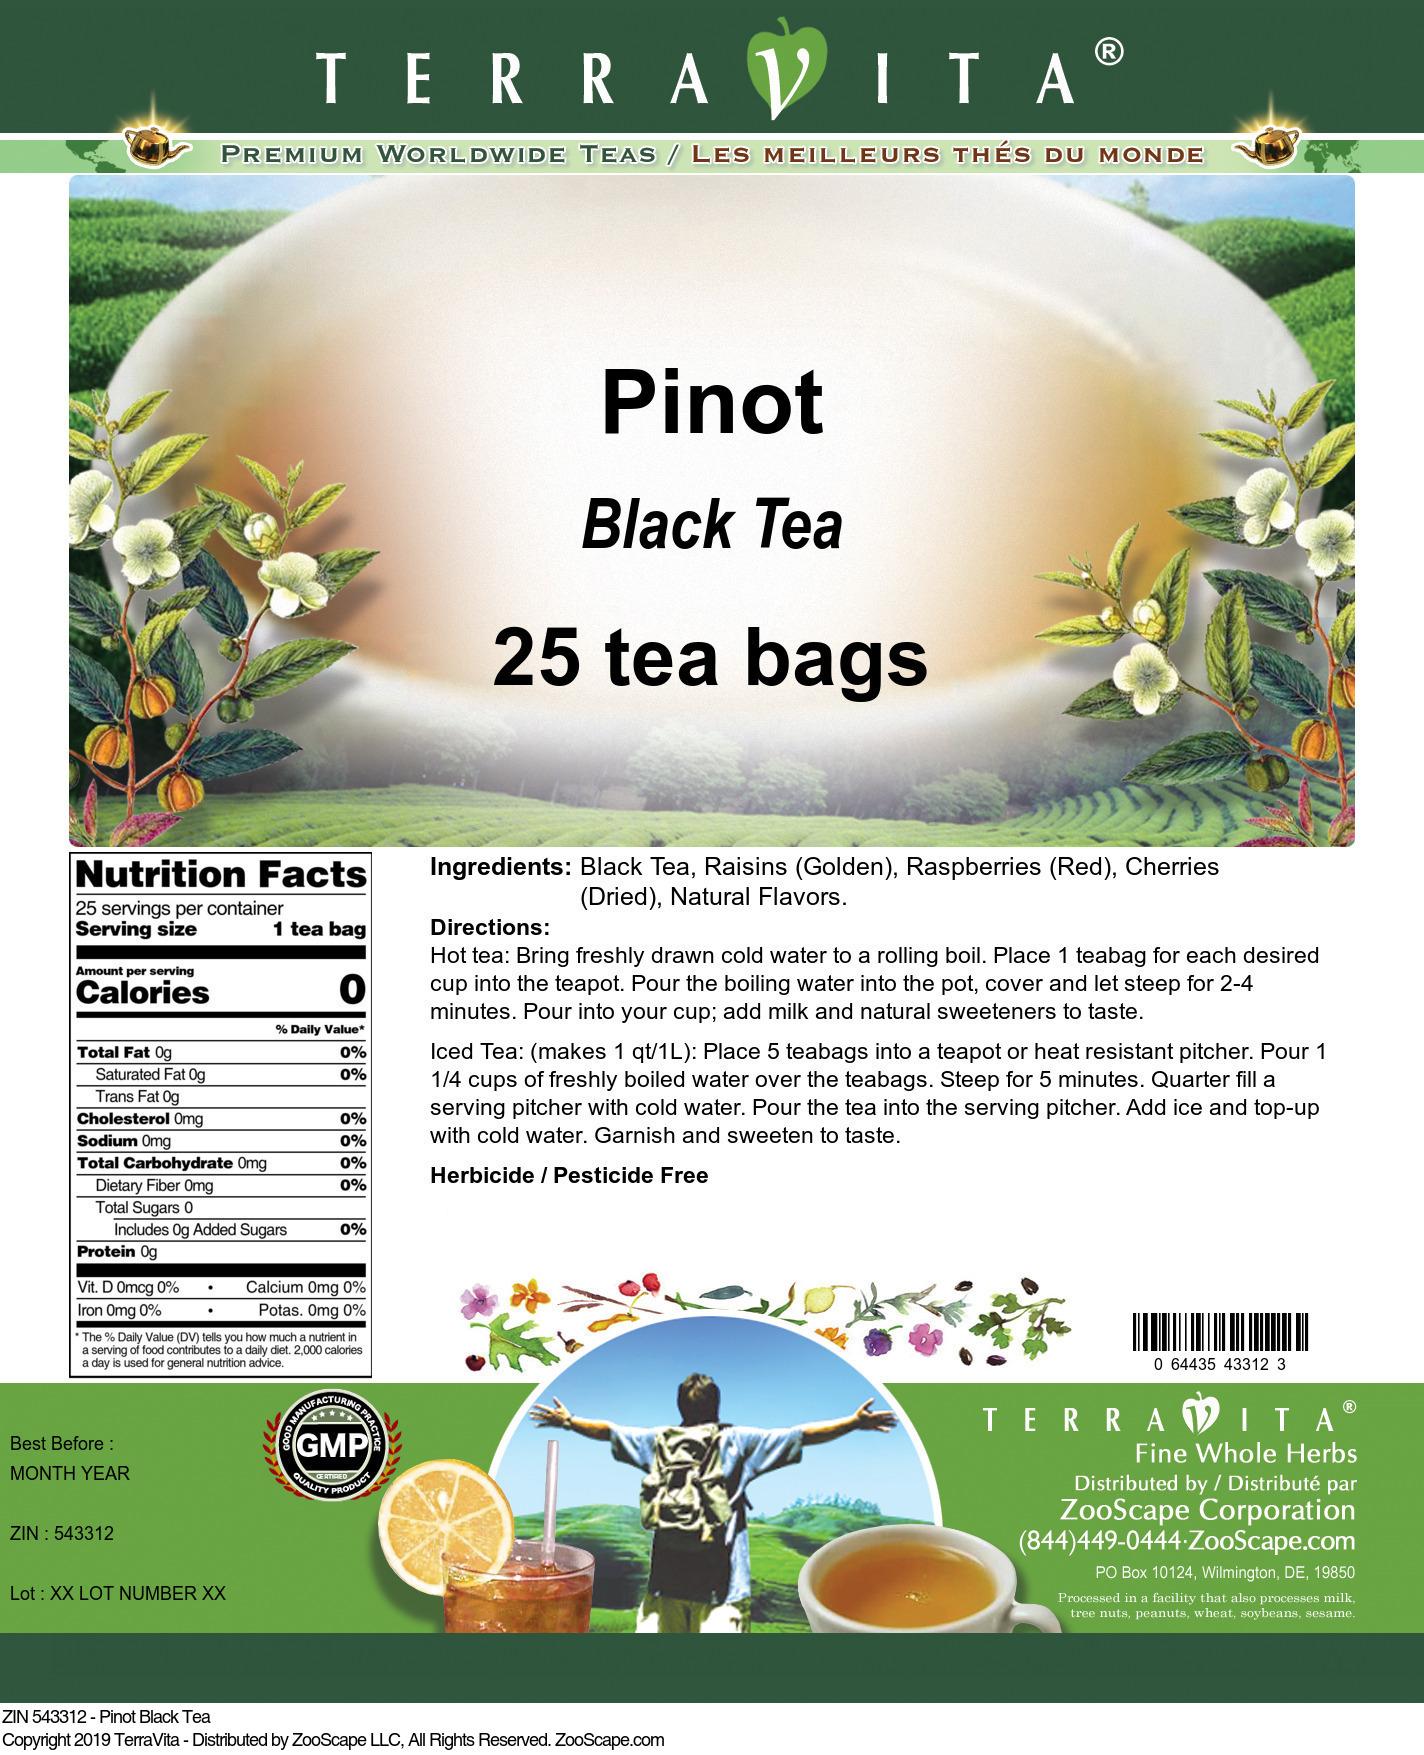 Pinot Black Tea